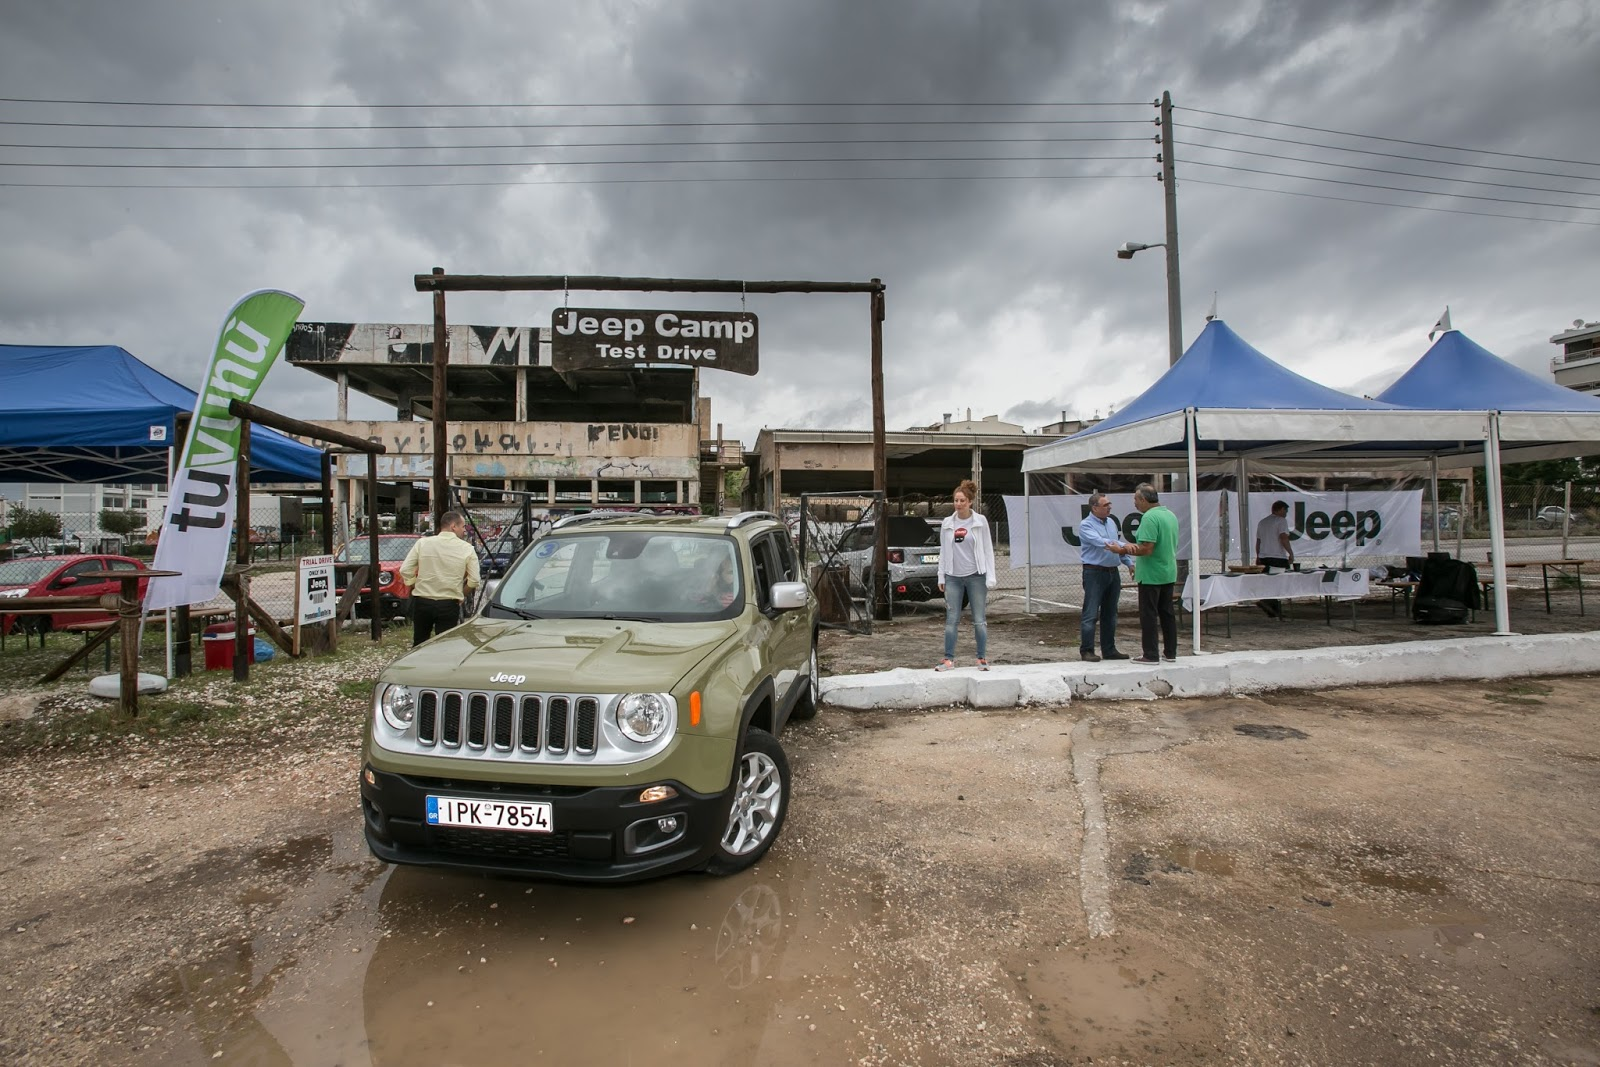 JEEP%2BCAMP GK 0234 Πετάμε ένα Jeep Renegade σε λάσπες, πέτρες, άμμο, λίμνες. Θα τα καταφέρει;